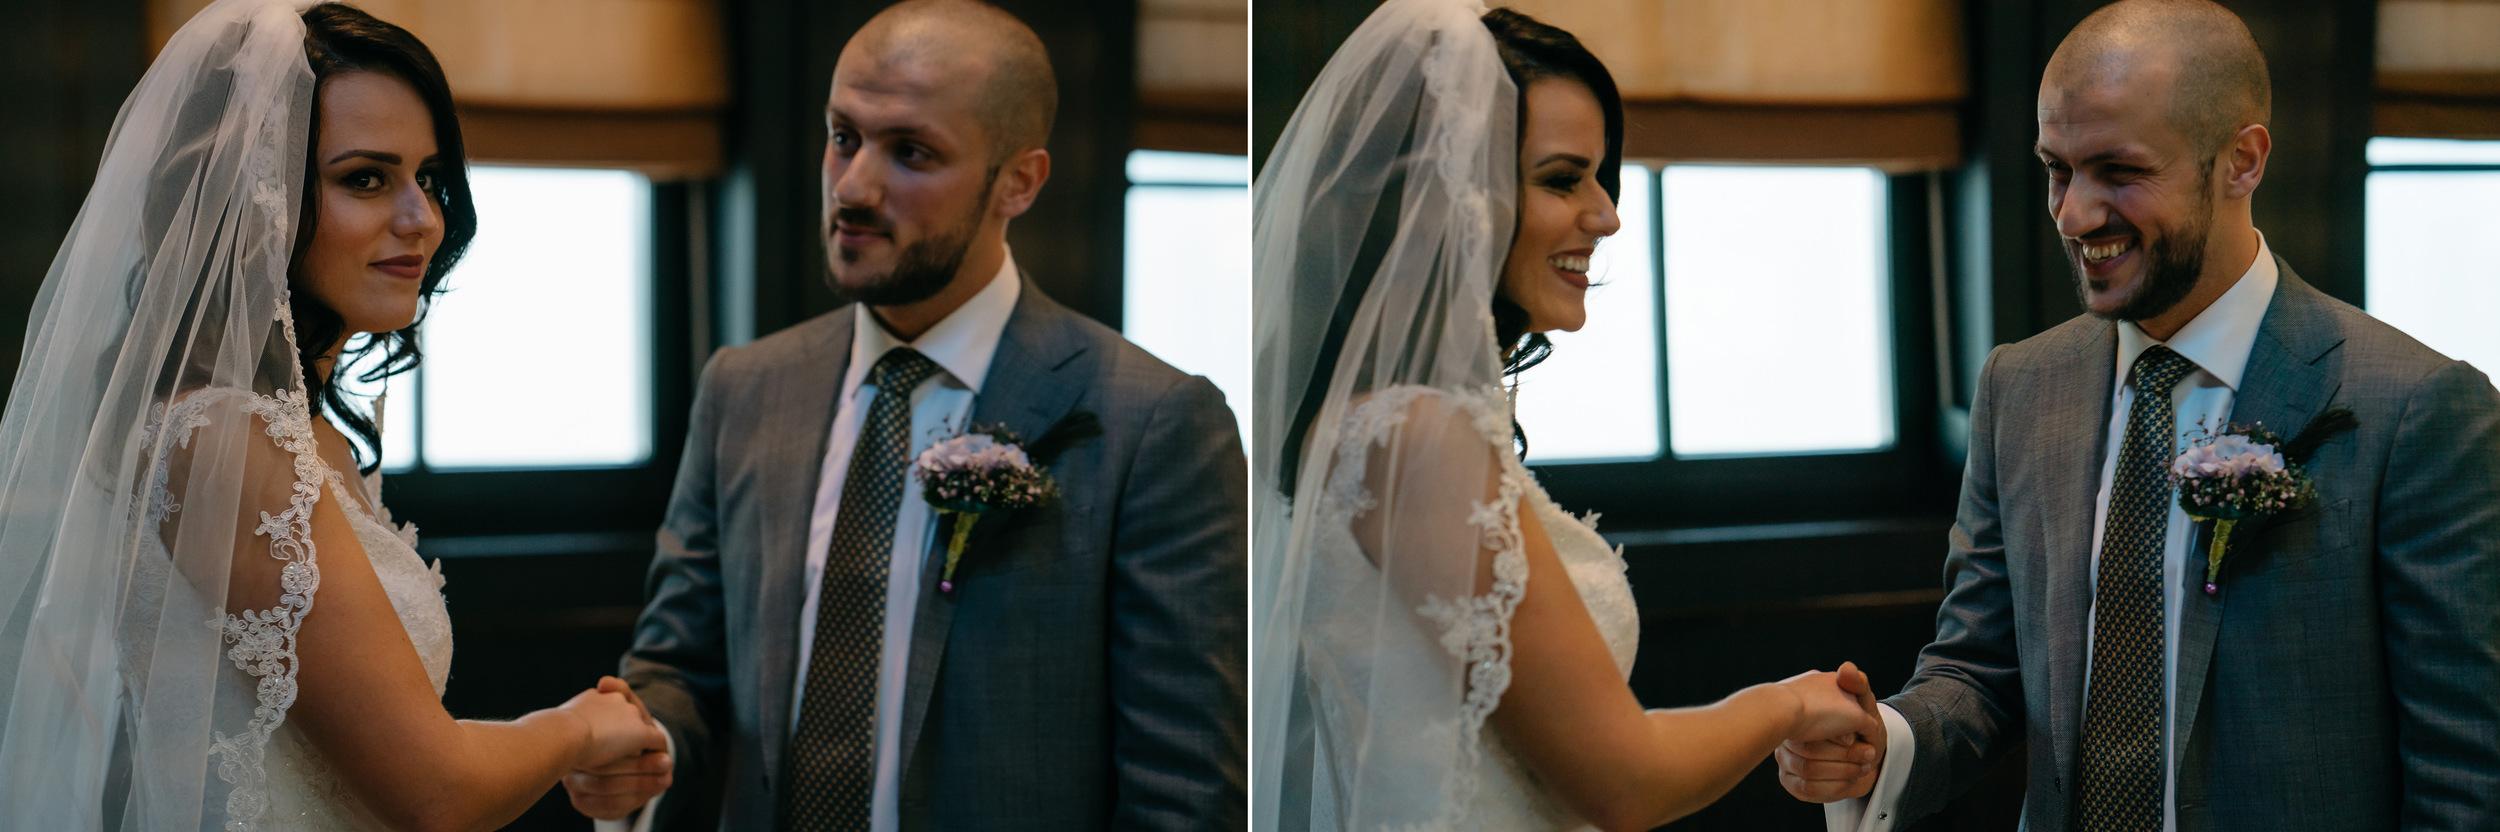 bruidsfotografie-bruidsfotograaf-mark-hadden-amsterdam-rotterdam-utrecht-wedding-photographer-Dado-Delila-118 copy.jpg